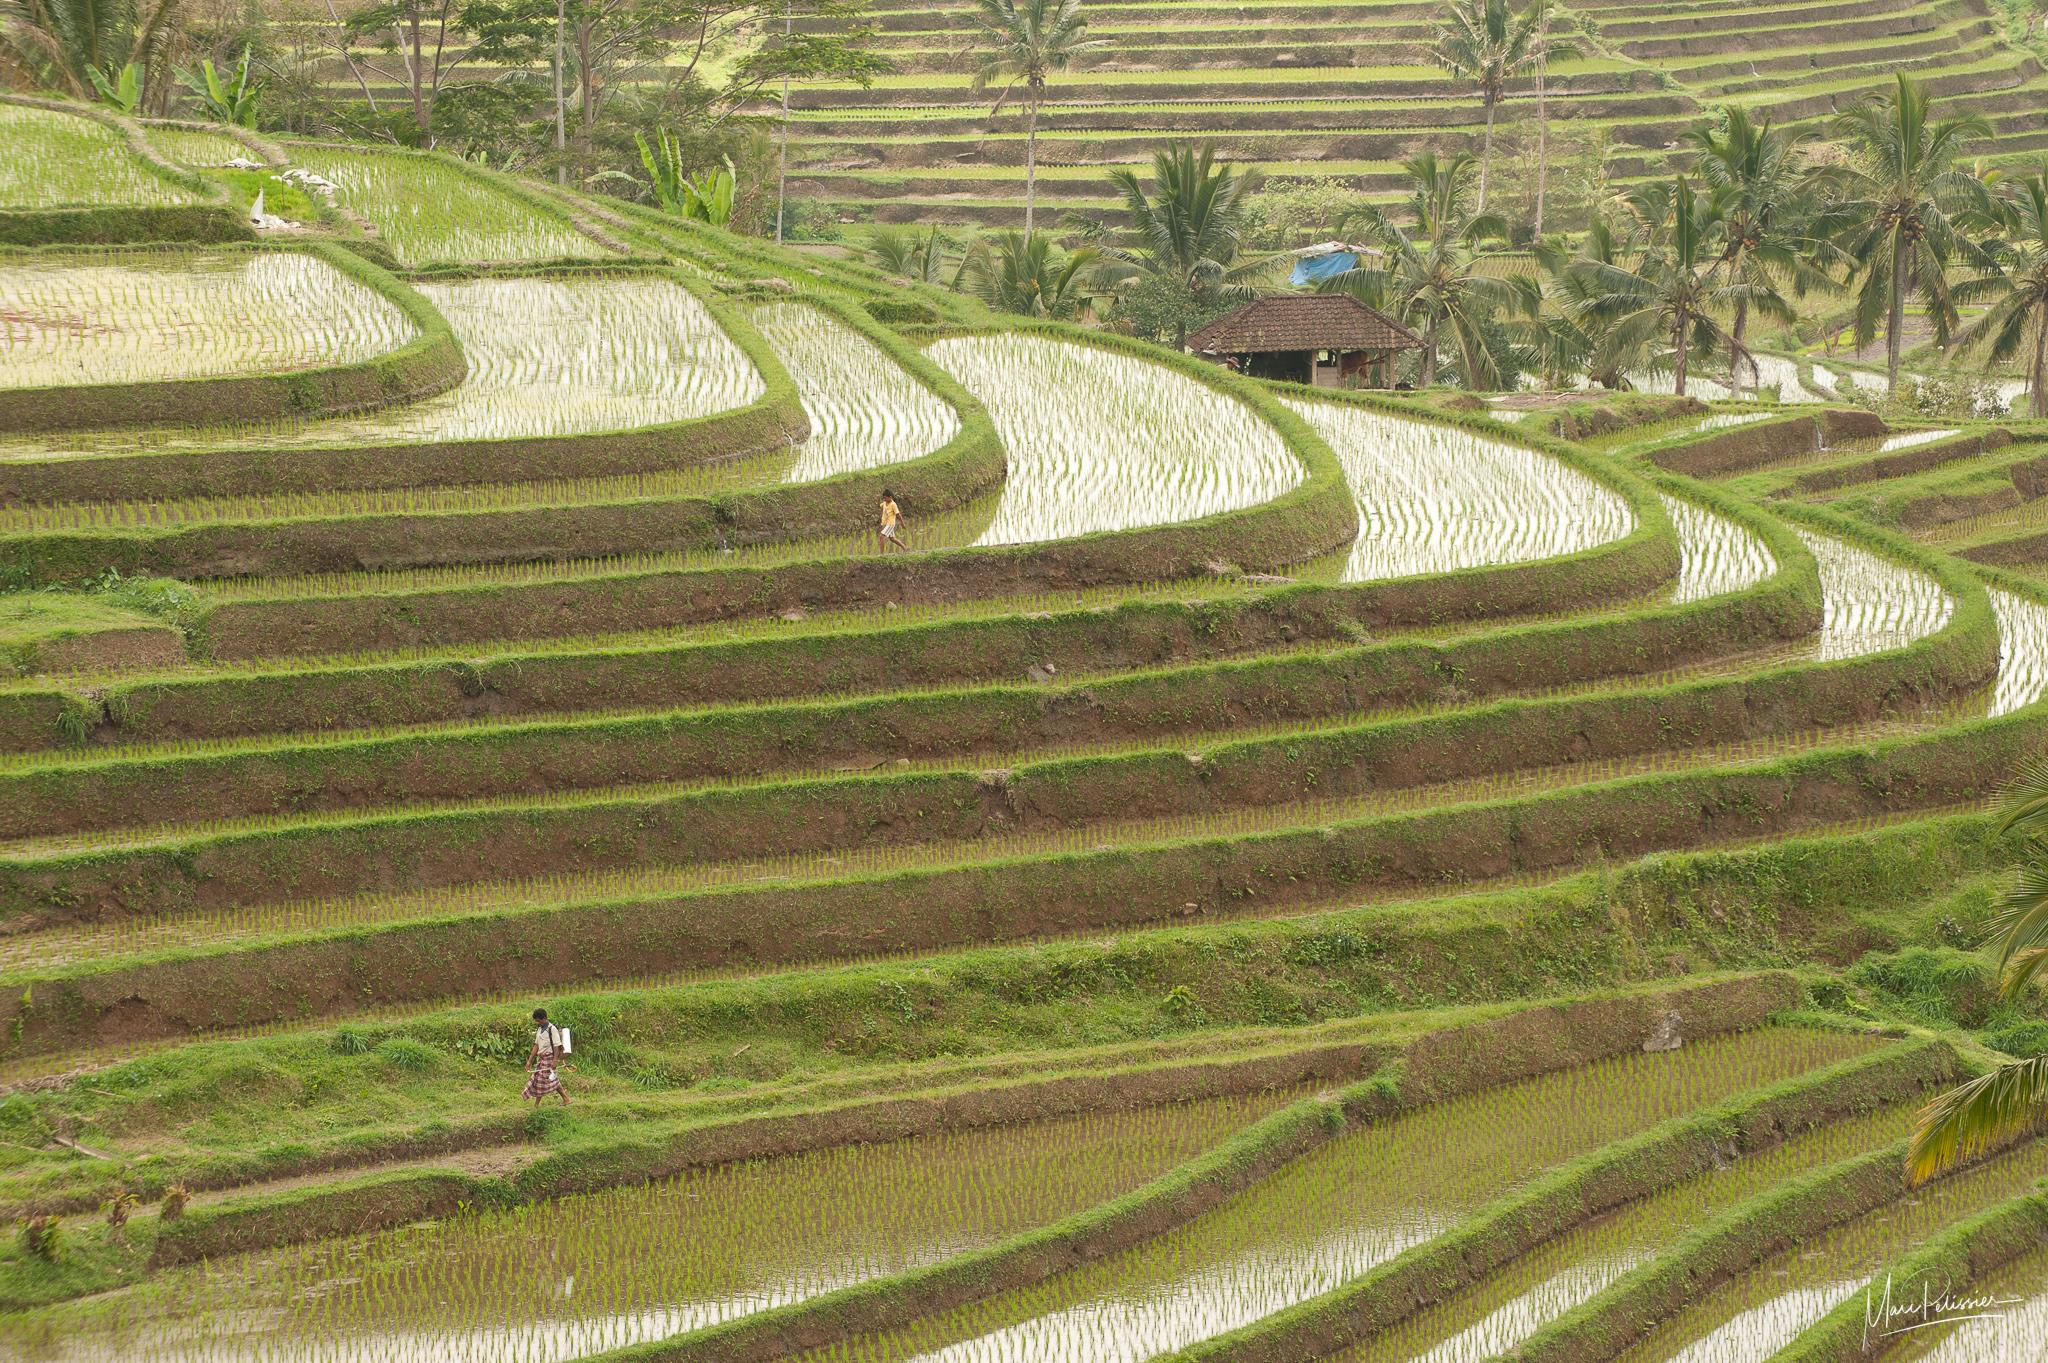 Jatiluwih Rice terrace, Indonesia